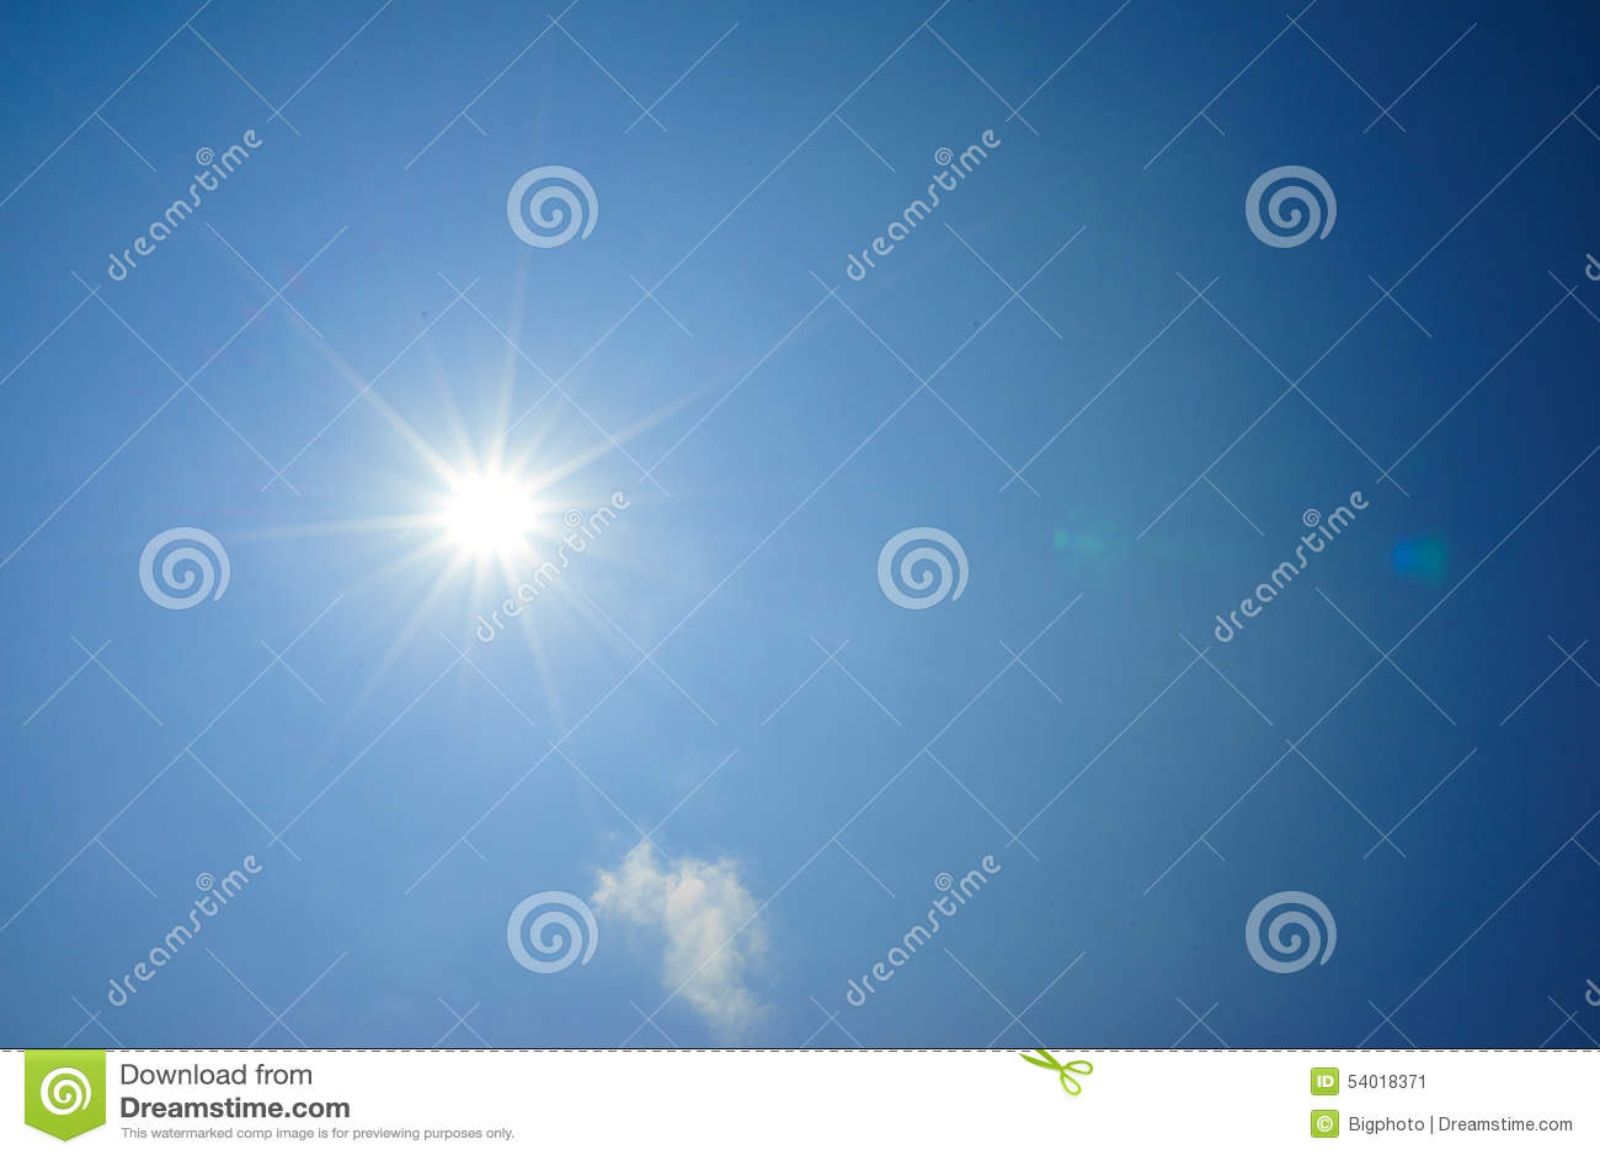 Sun shine in blue sky